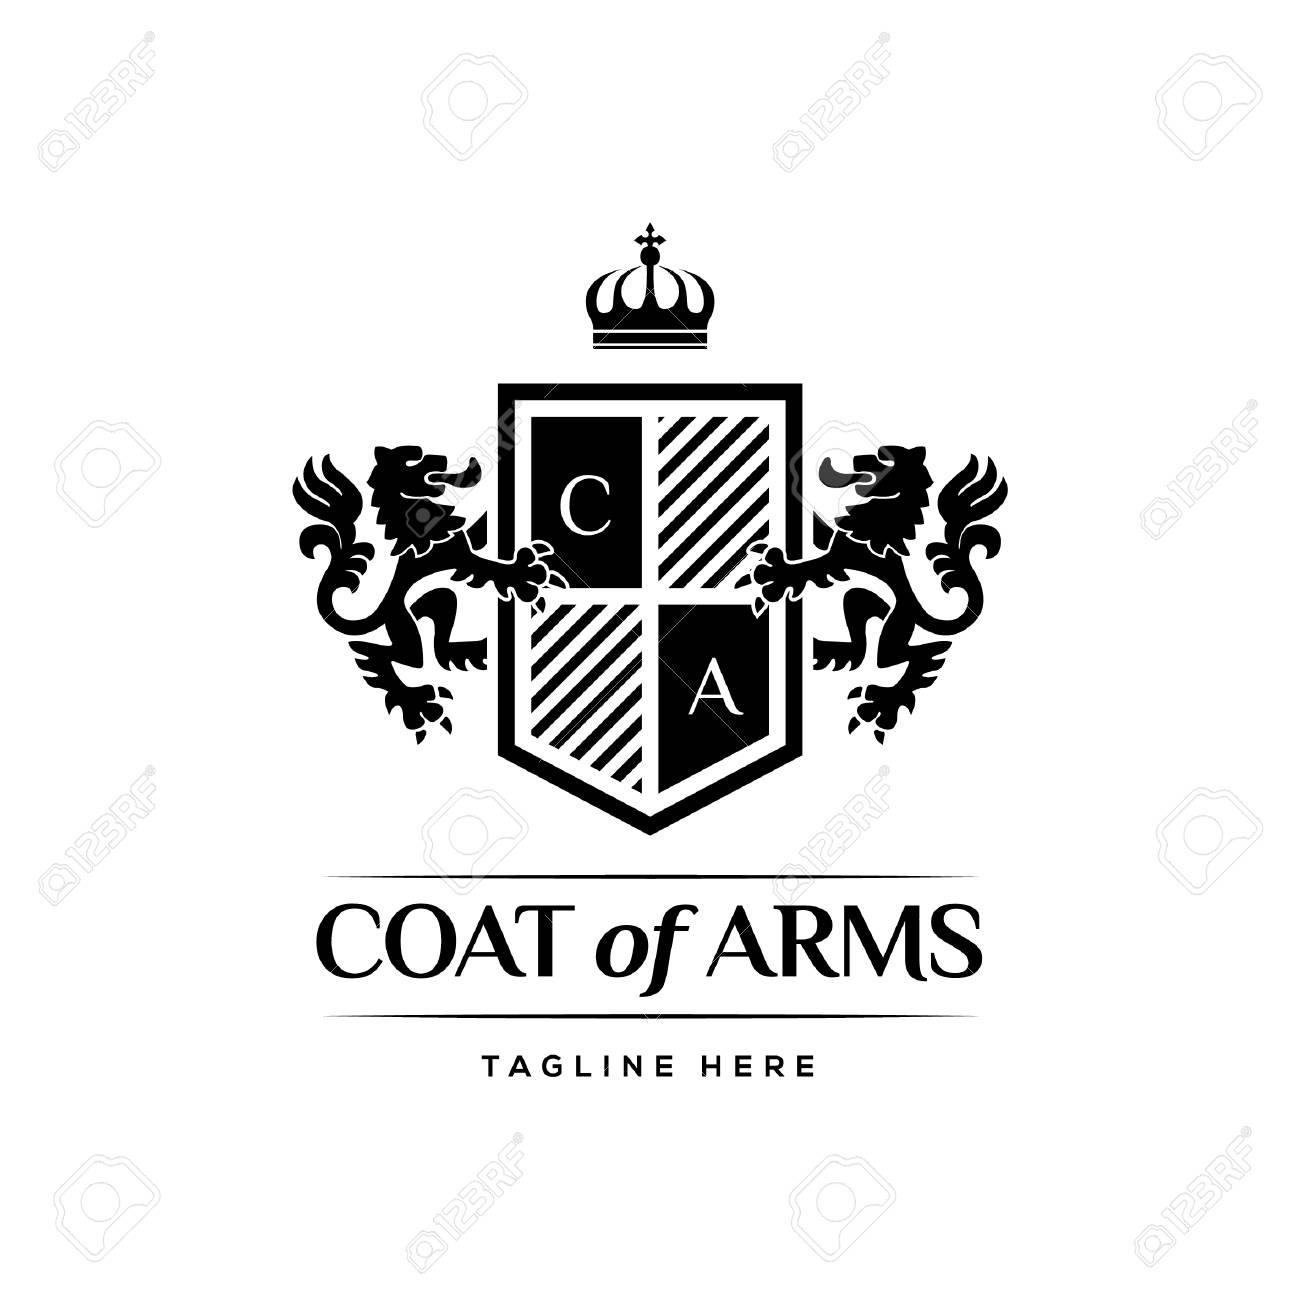 Coat Of Arms Heraldic Luxury Design Concept - 110517676